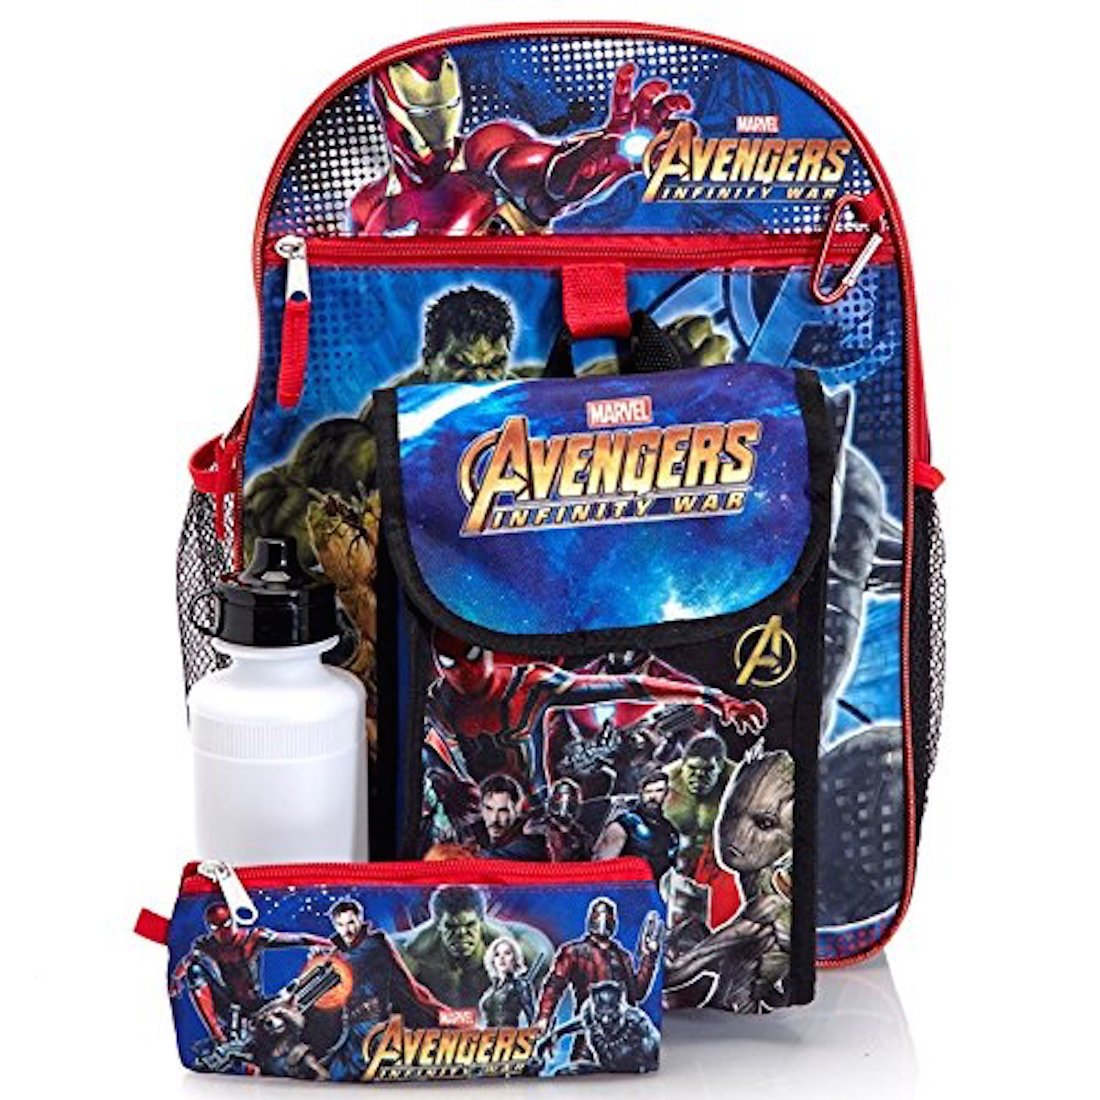 Marvel Avengers Kids 5 Piece Backpack Set - 16